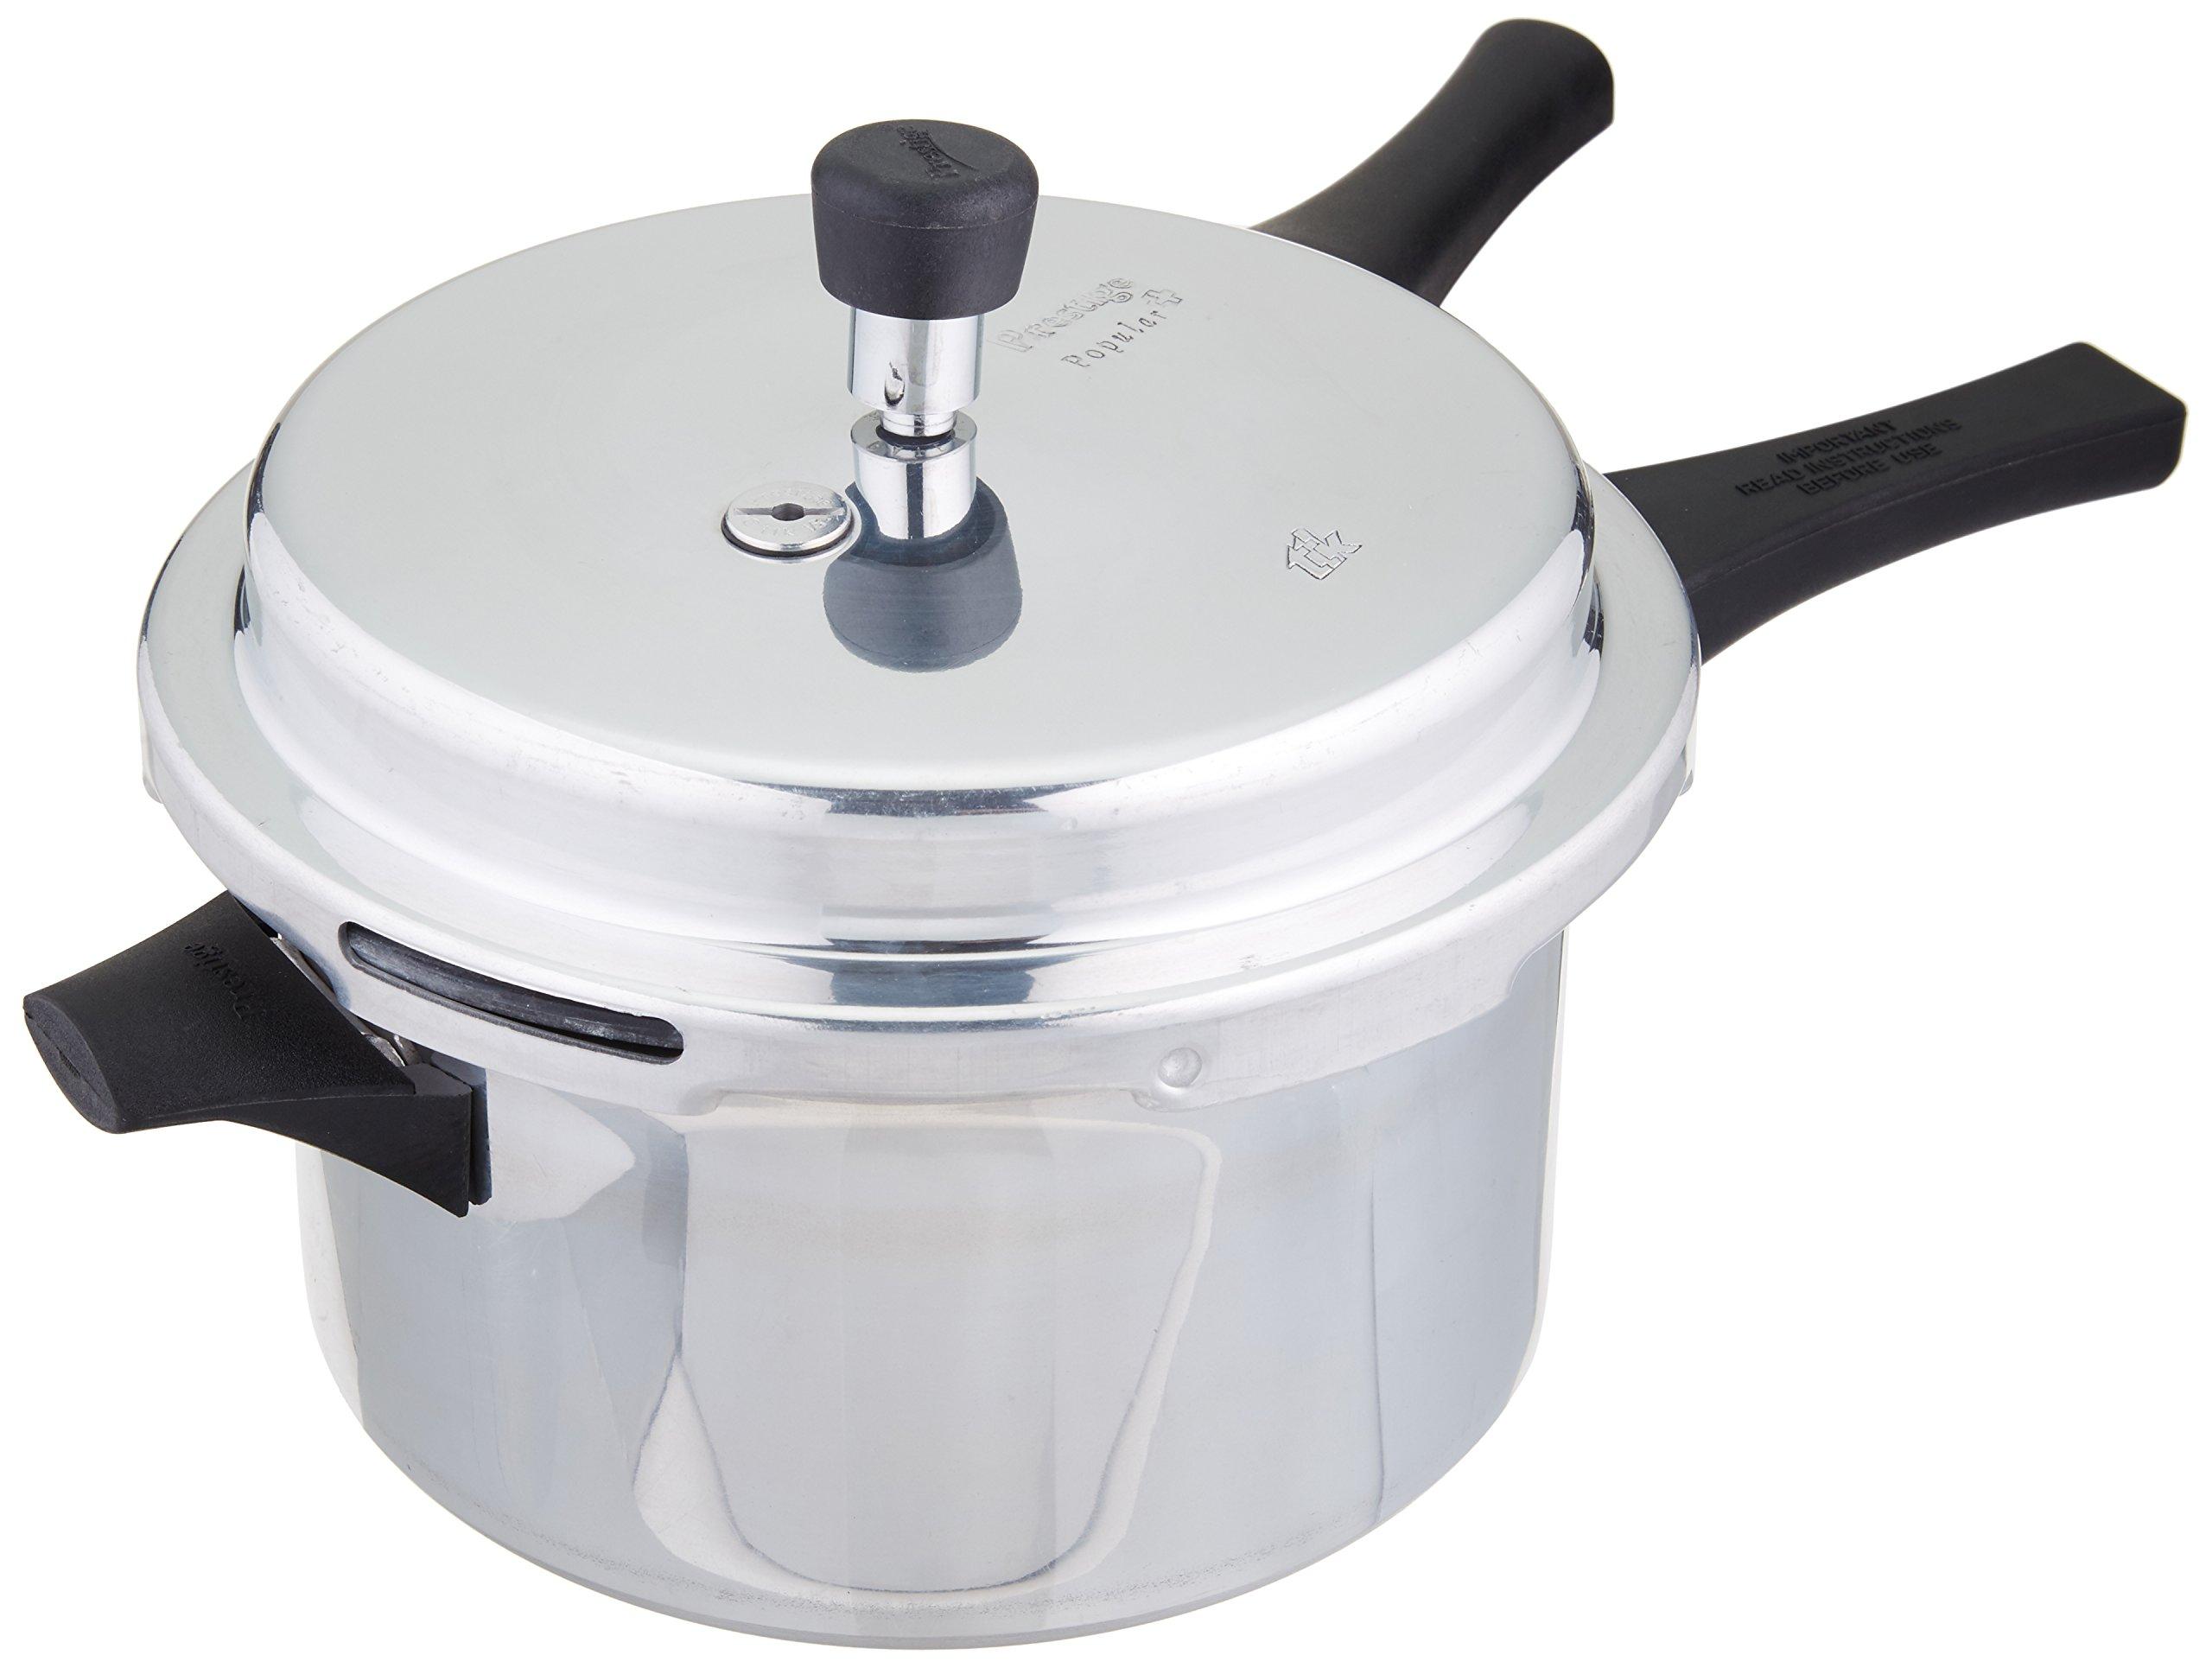 Prestige Popular Plus Induction Base Aluminum Pressure Cooker, 4-Liter